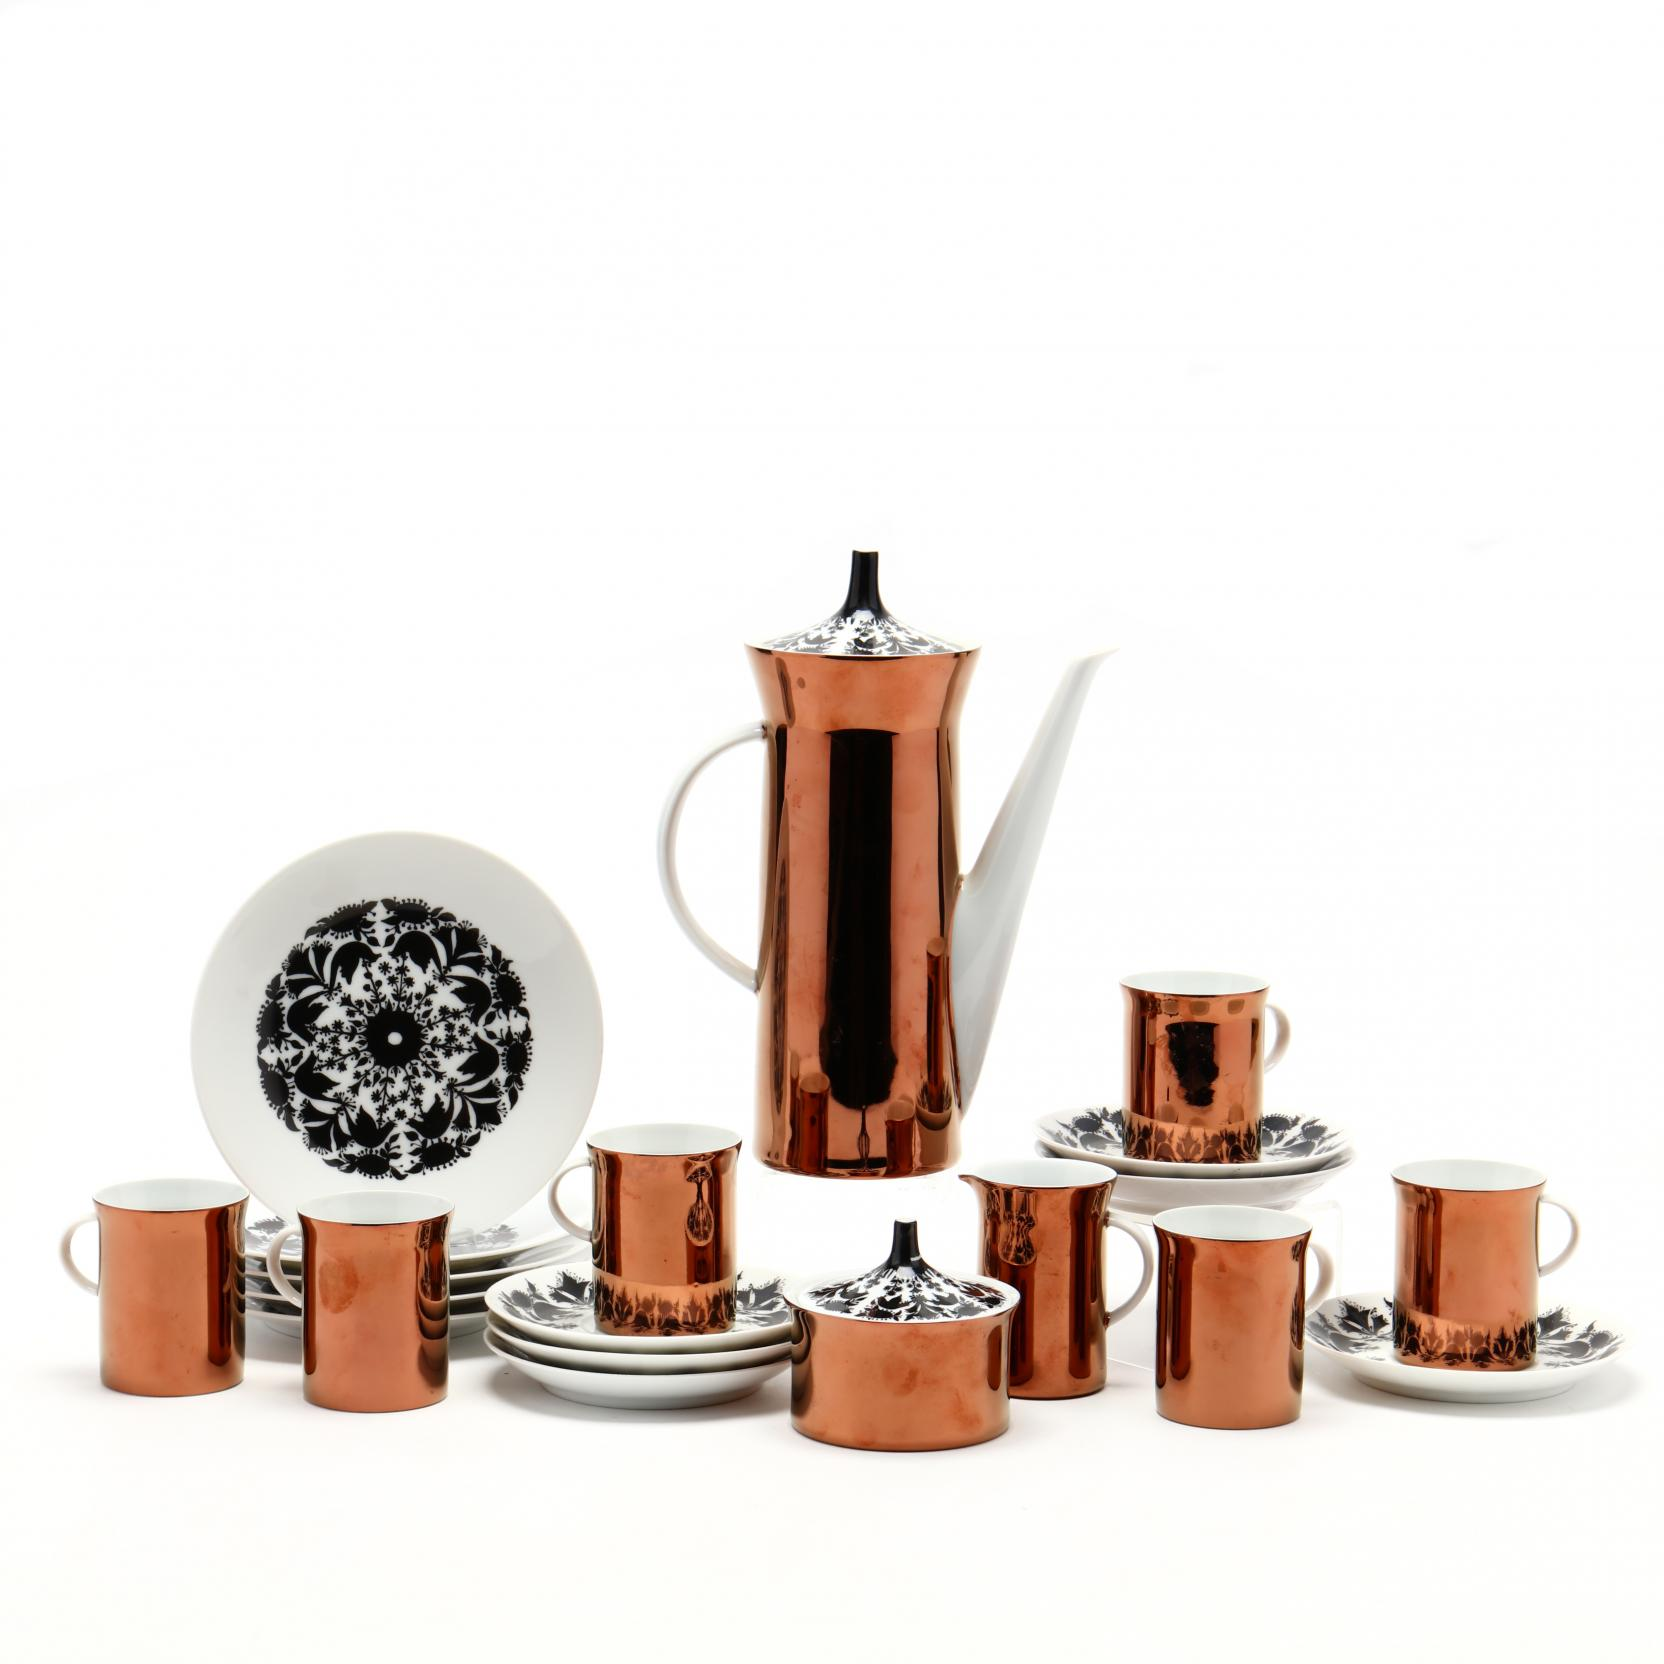 rosenthal-hilton-studio-line-porcelain-dessert-set